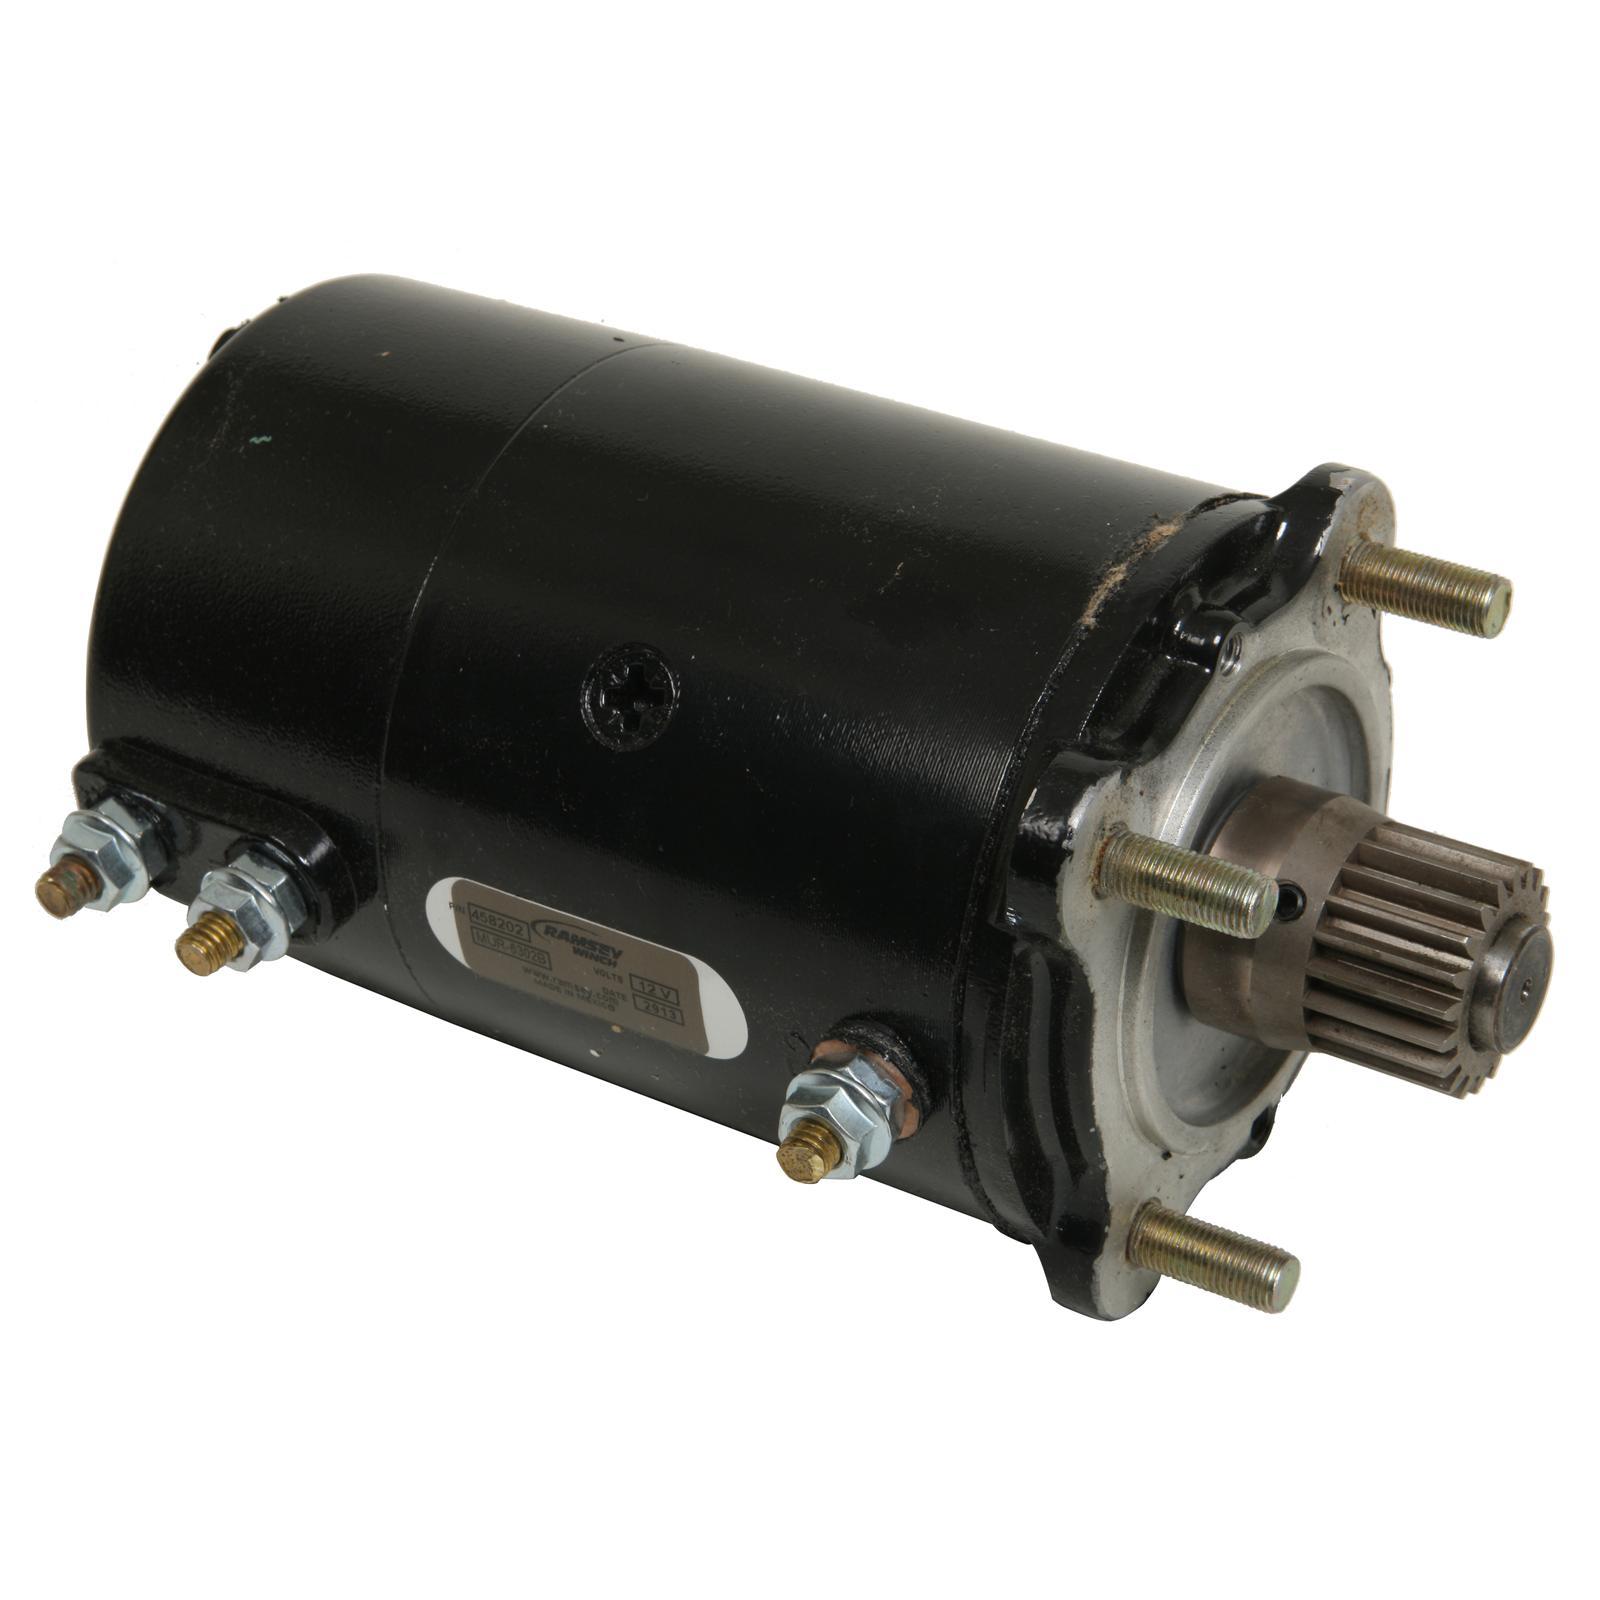 badlands 12000 pound winch wiring diagram franklin submersible pump control box 12 000 lb badland wire